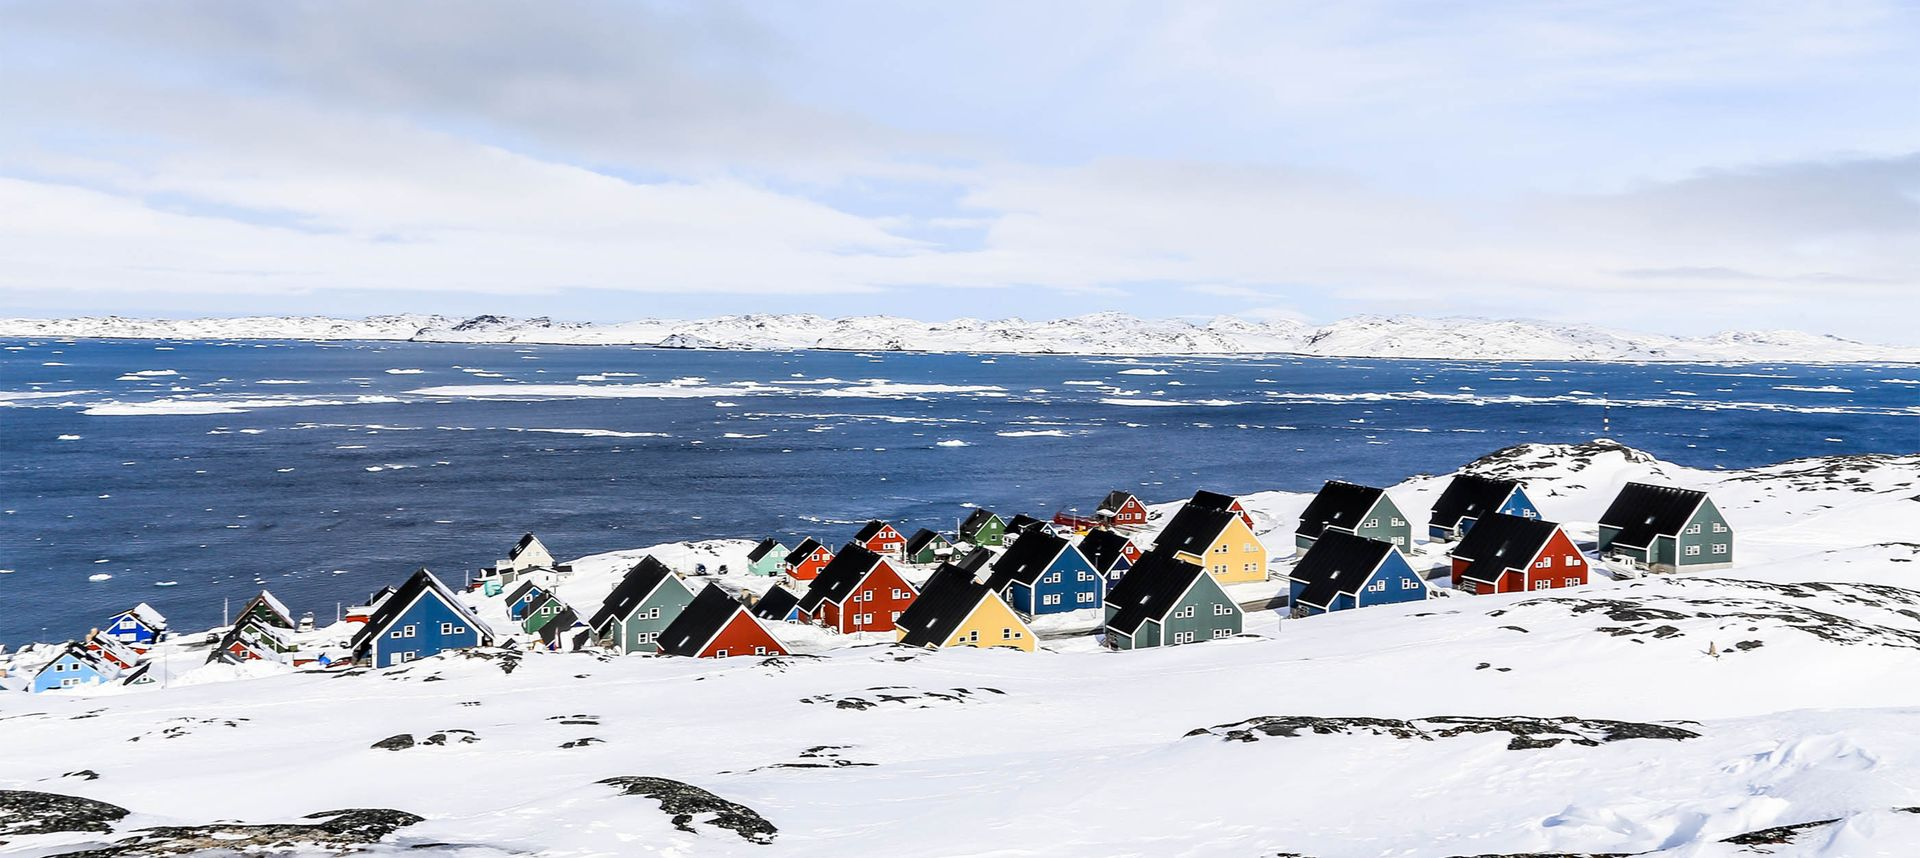 Greenland travel guide (Dreamstime)